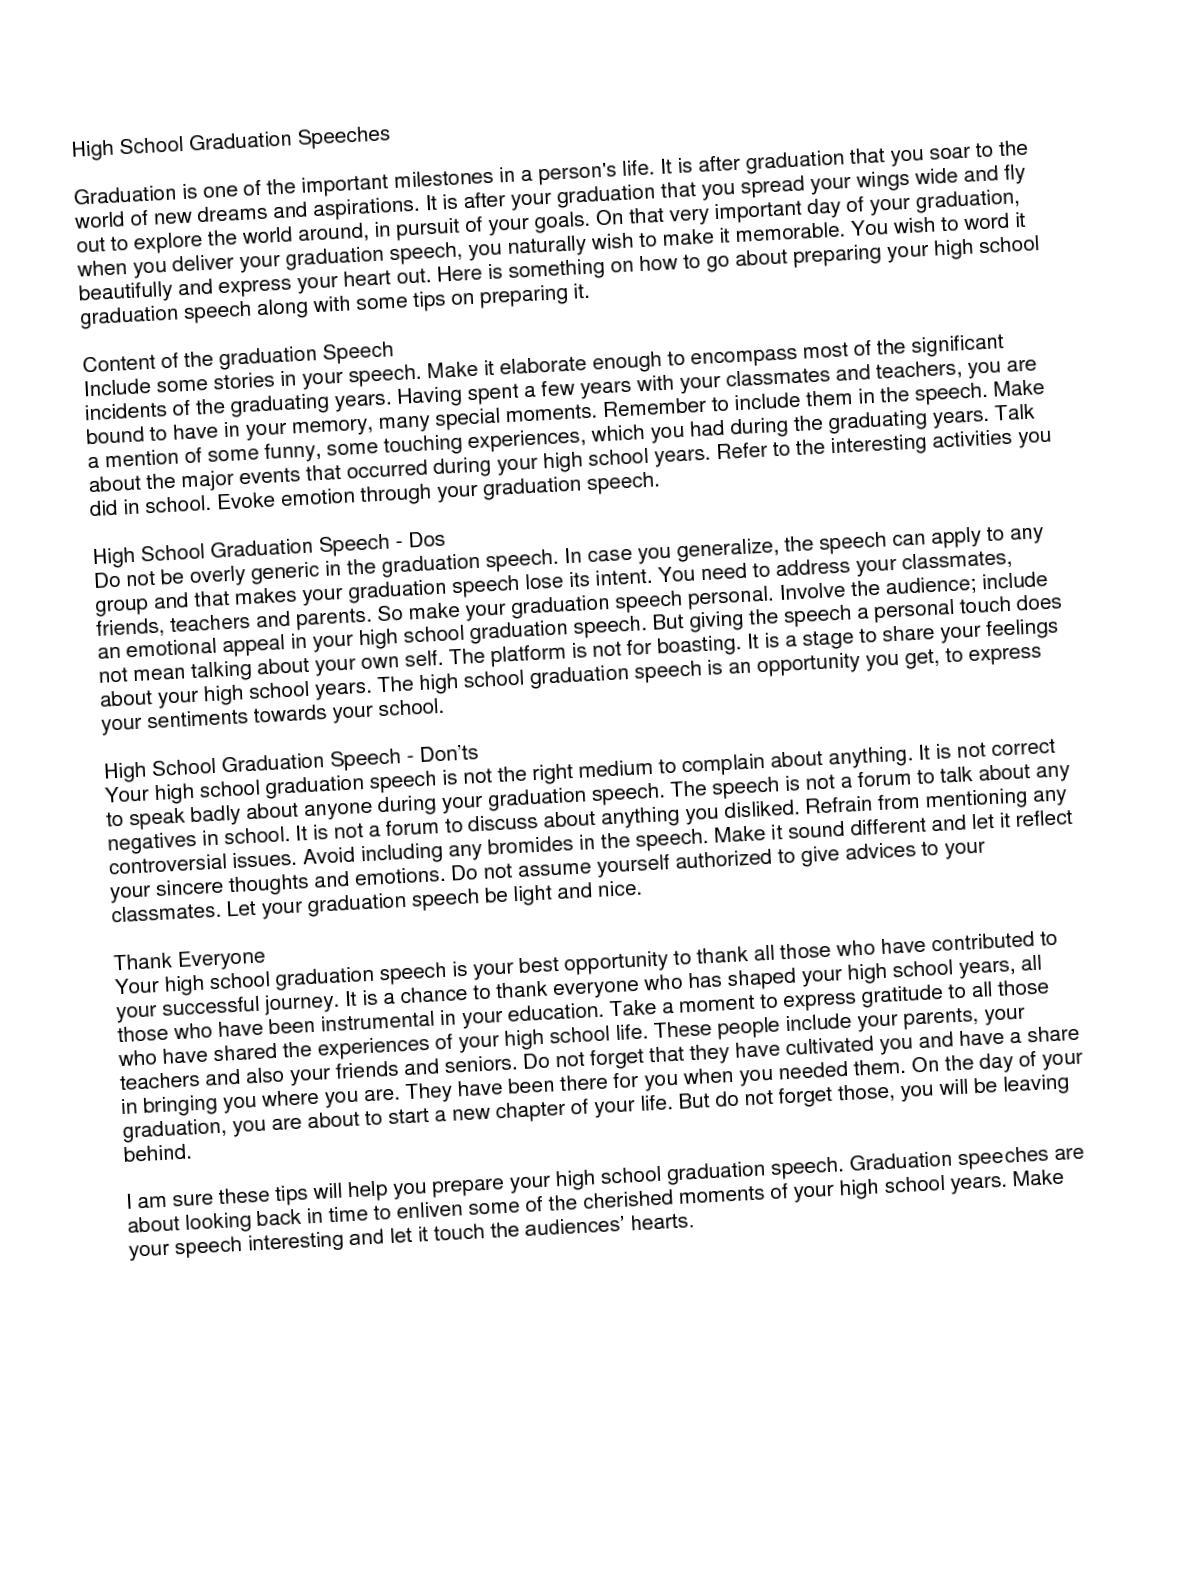 003 High School Graduation Essay Day Example L Rare Ceremony Full